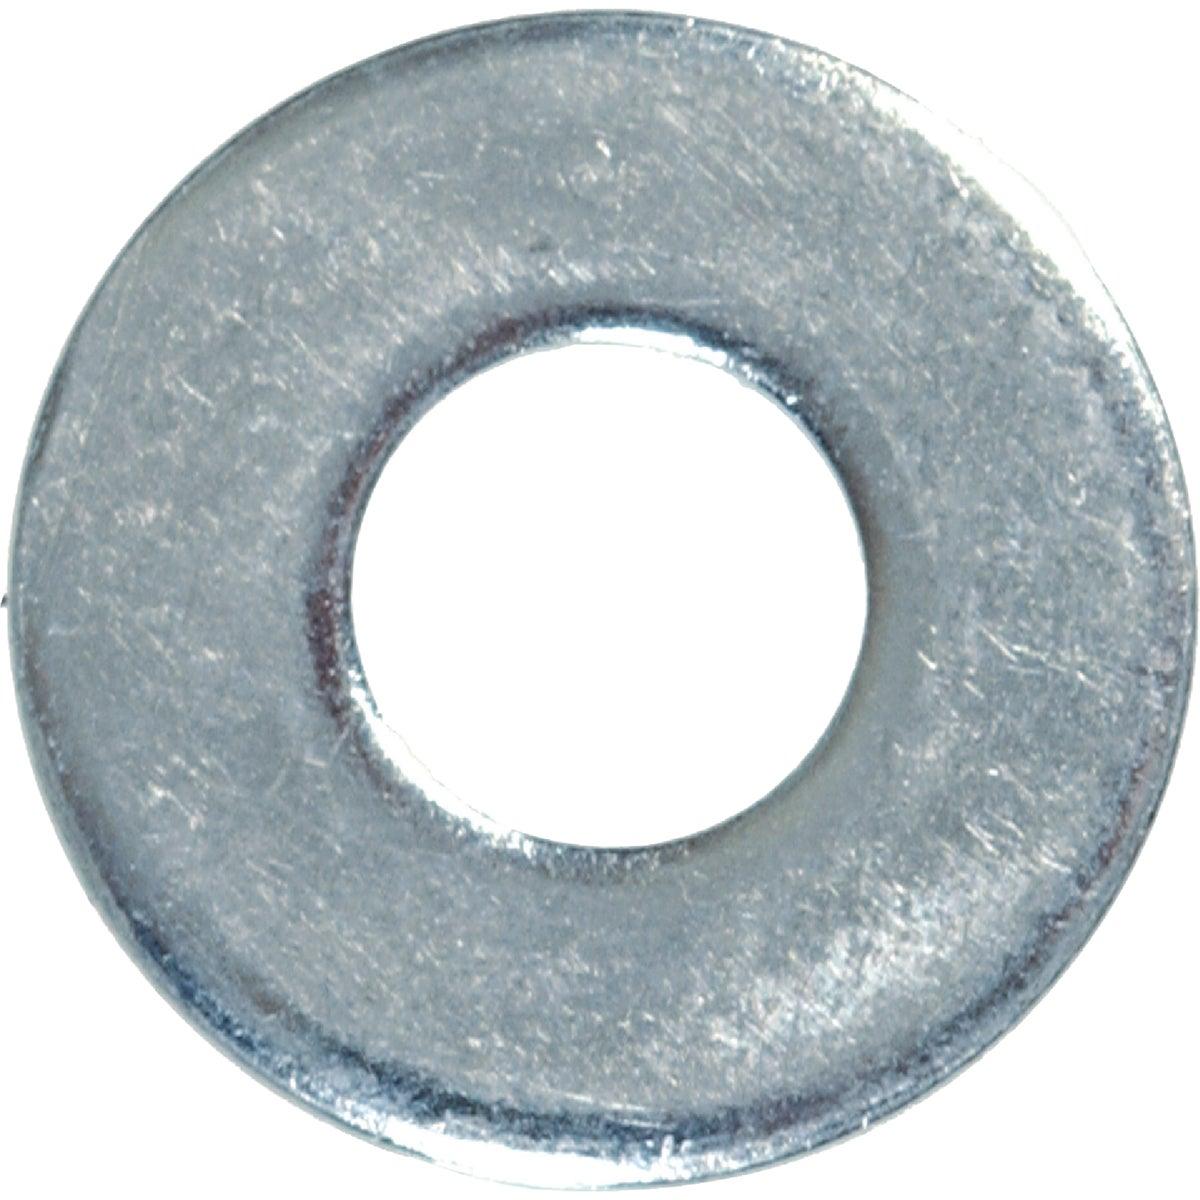 #10 Steel Flat Washer